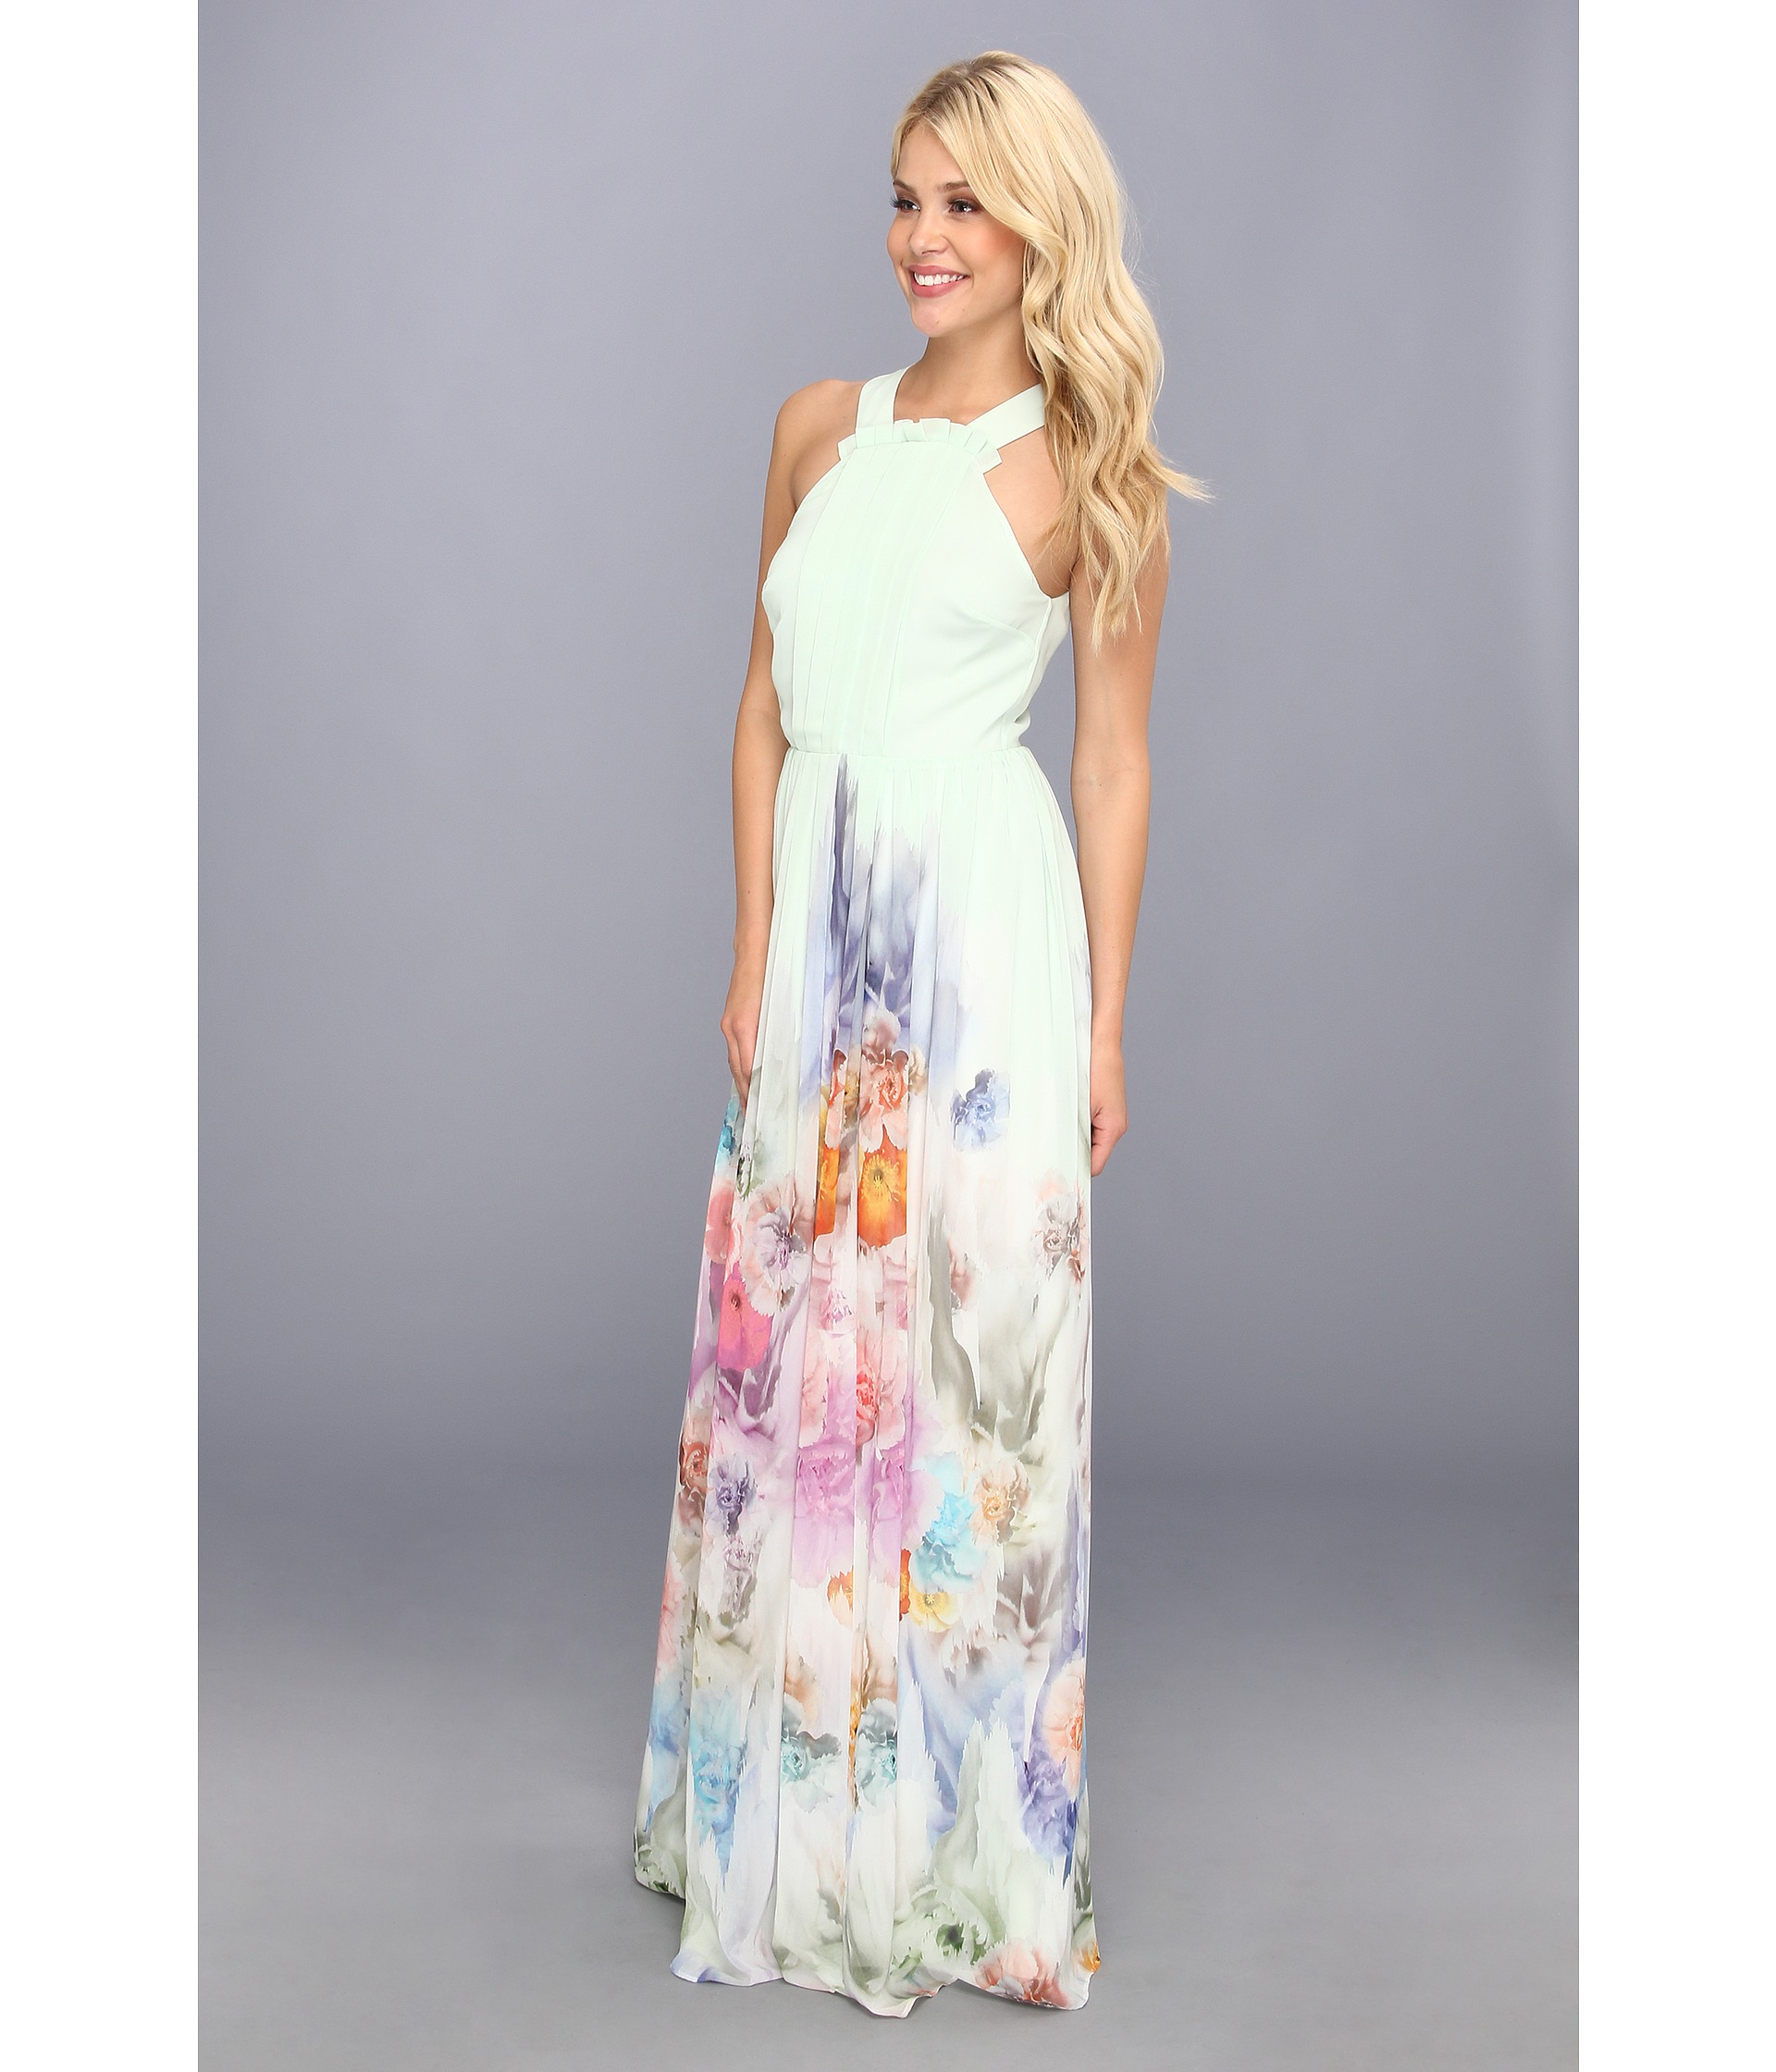 6a23f2b26372 Lyst - Ted Baker Beula Sugar Sweet Floral Maxi Dress